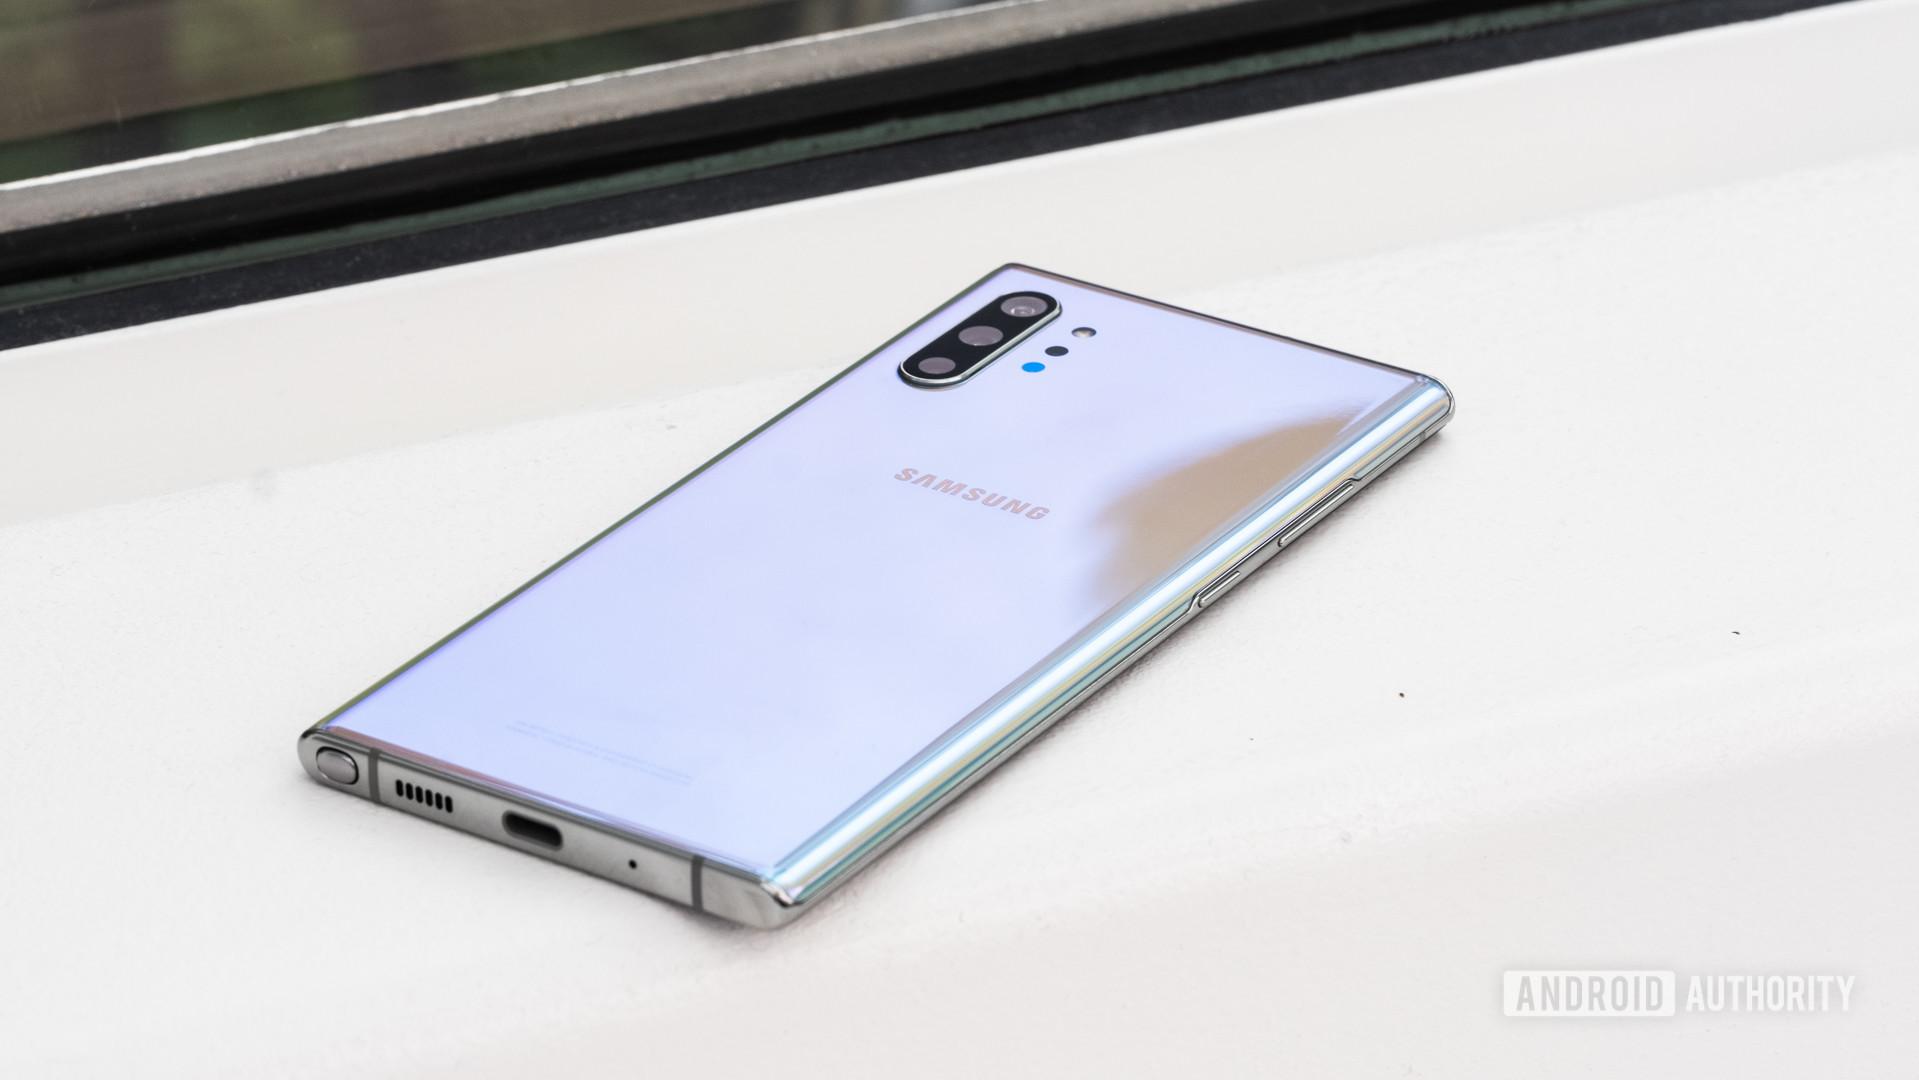 Samsung Galaxy Note 10 Plus back at angle